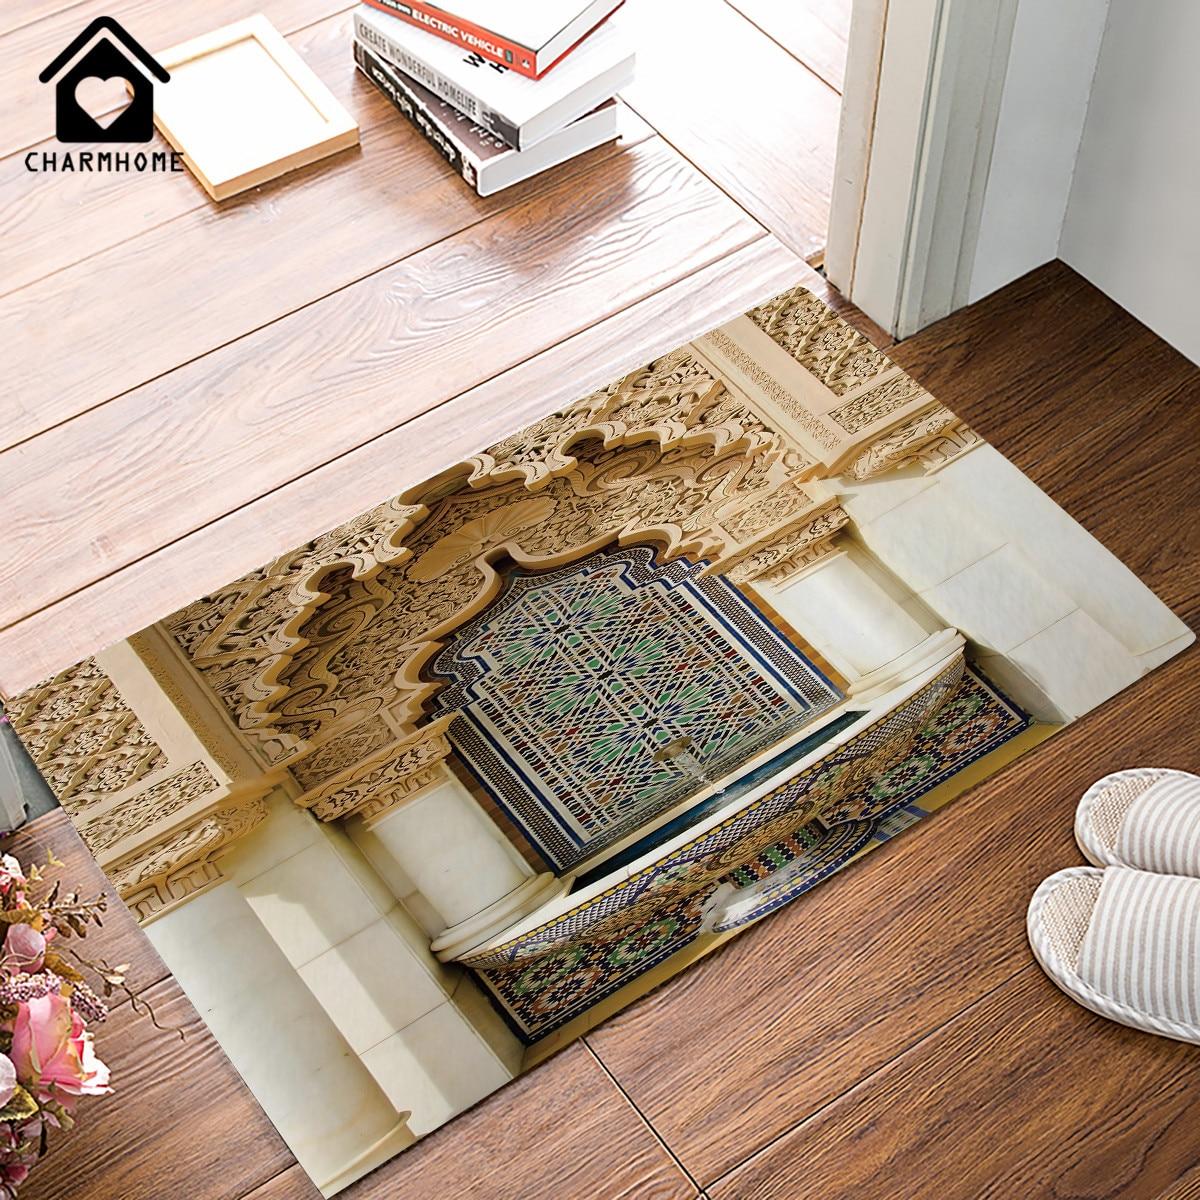 Aliexpress.com : Buy CHARMHOME Living Room Moroccan Decor